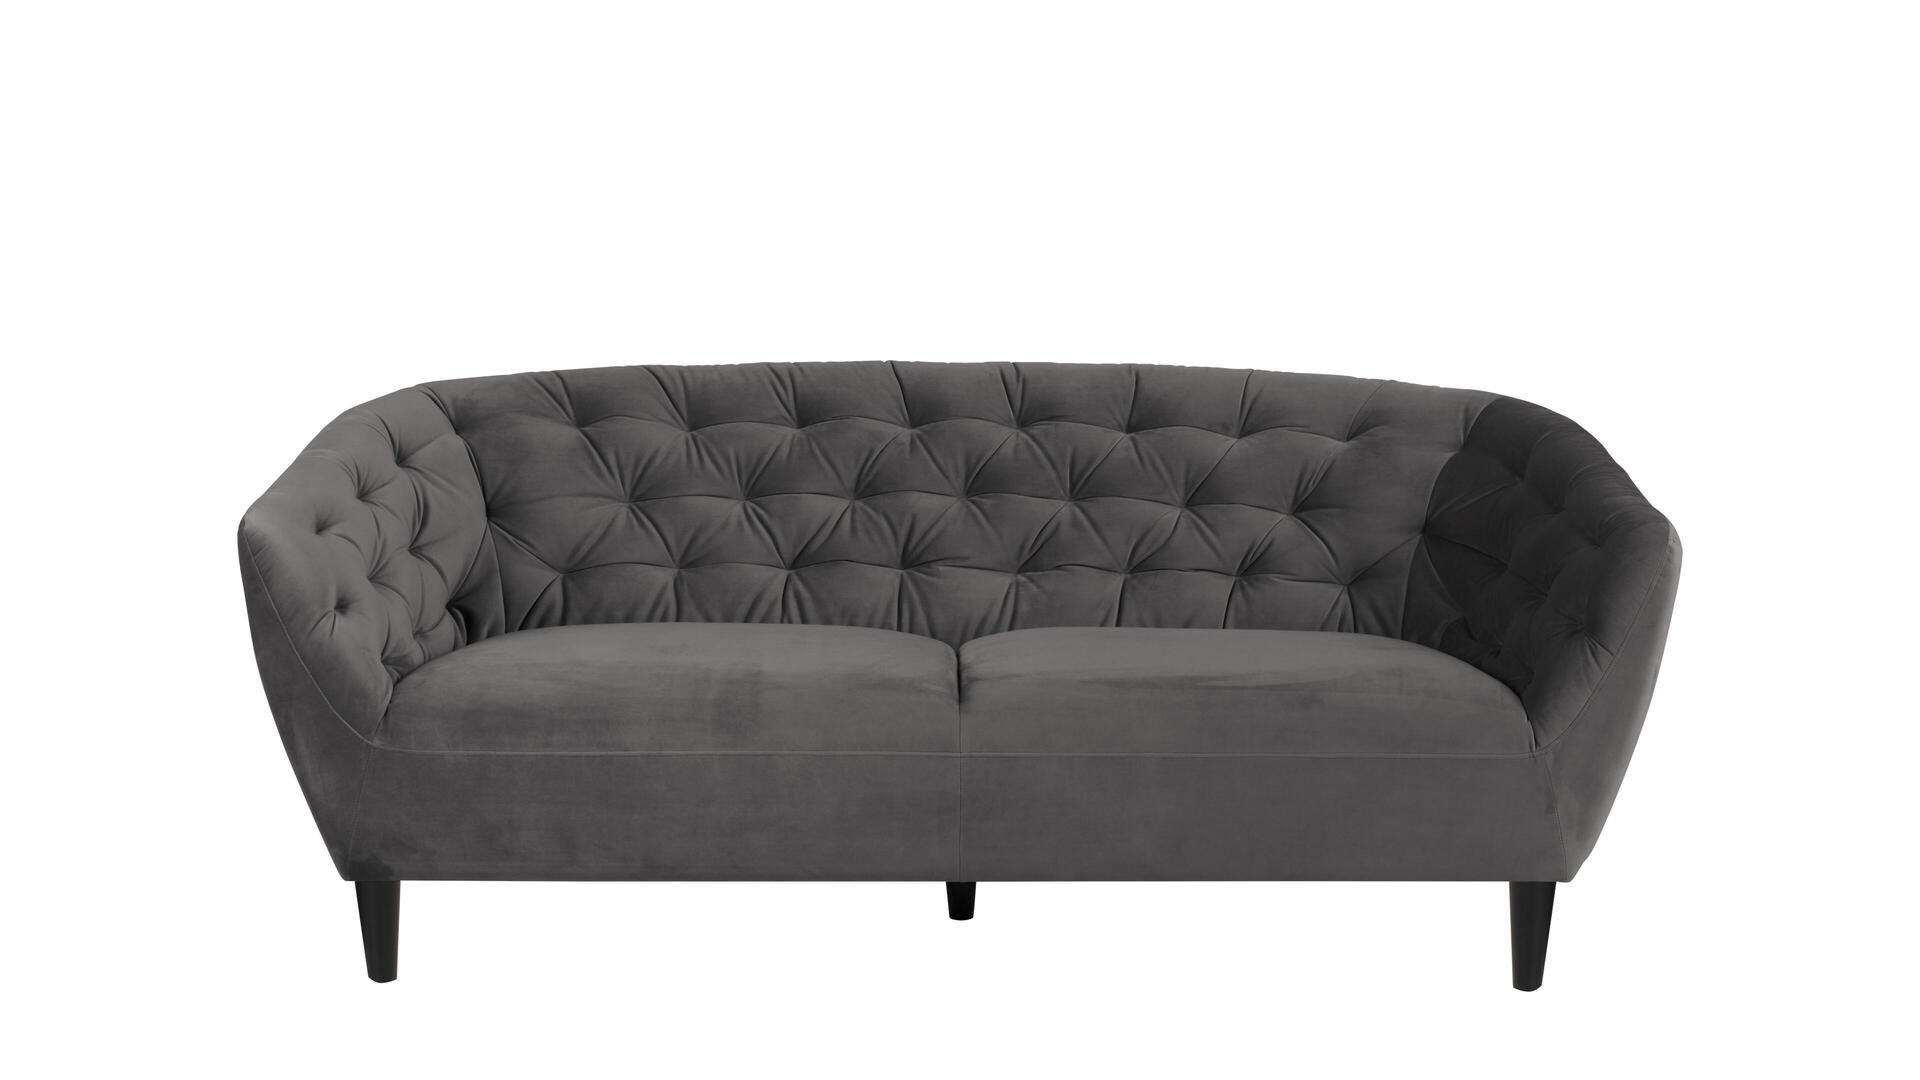 Click&Collect Dreisitzer-Sofa als bequemes Polstermöbel